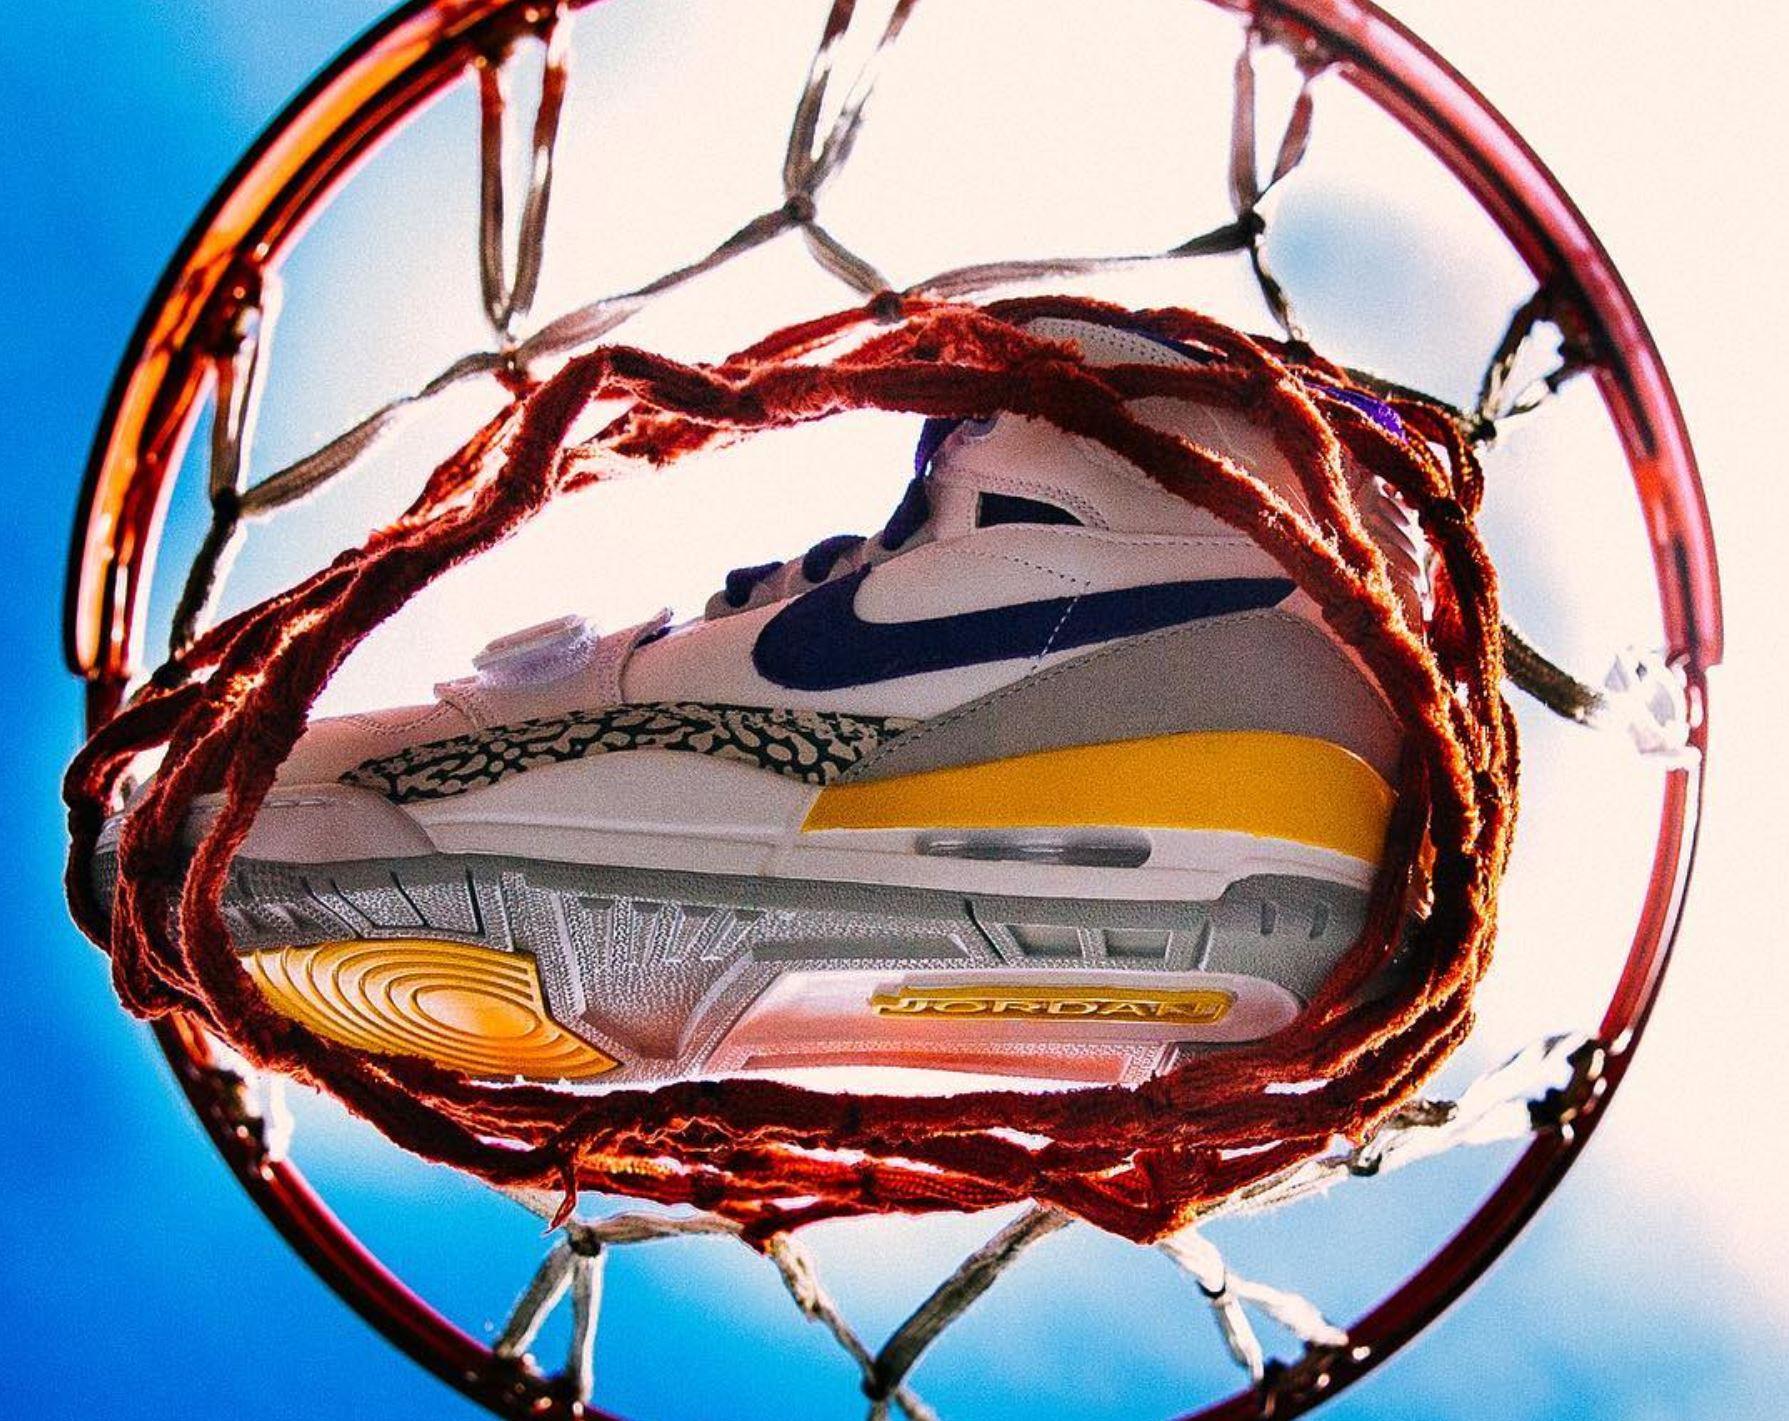 4d11cc21781 jordan legacy 312 lakers · Jordan Brand / Kicks Off Court / Retro Lifestyle  ...